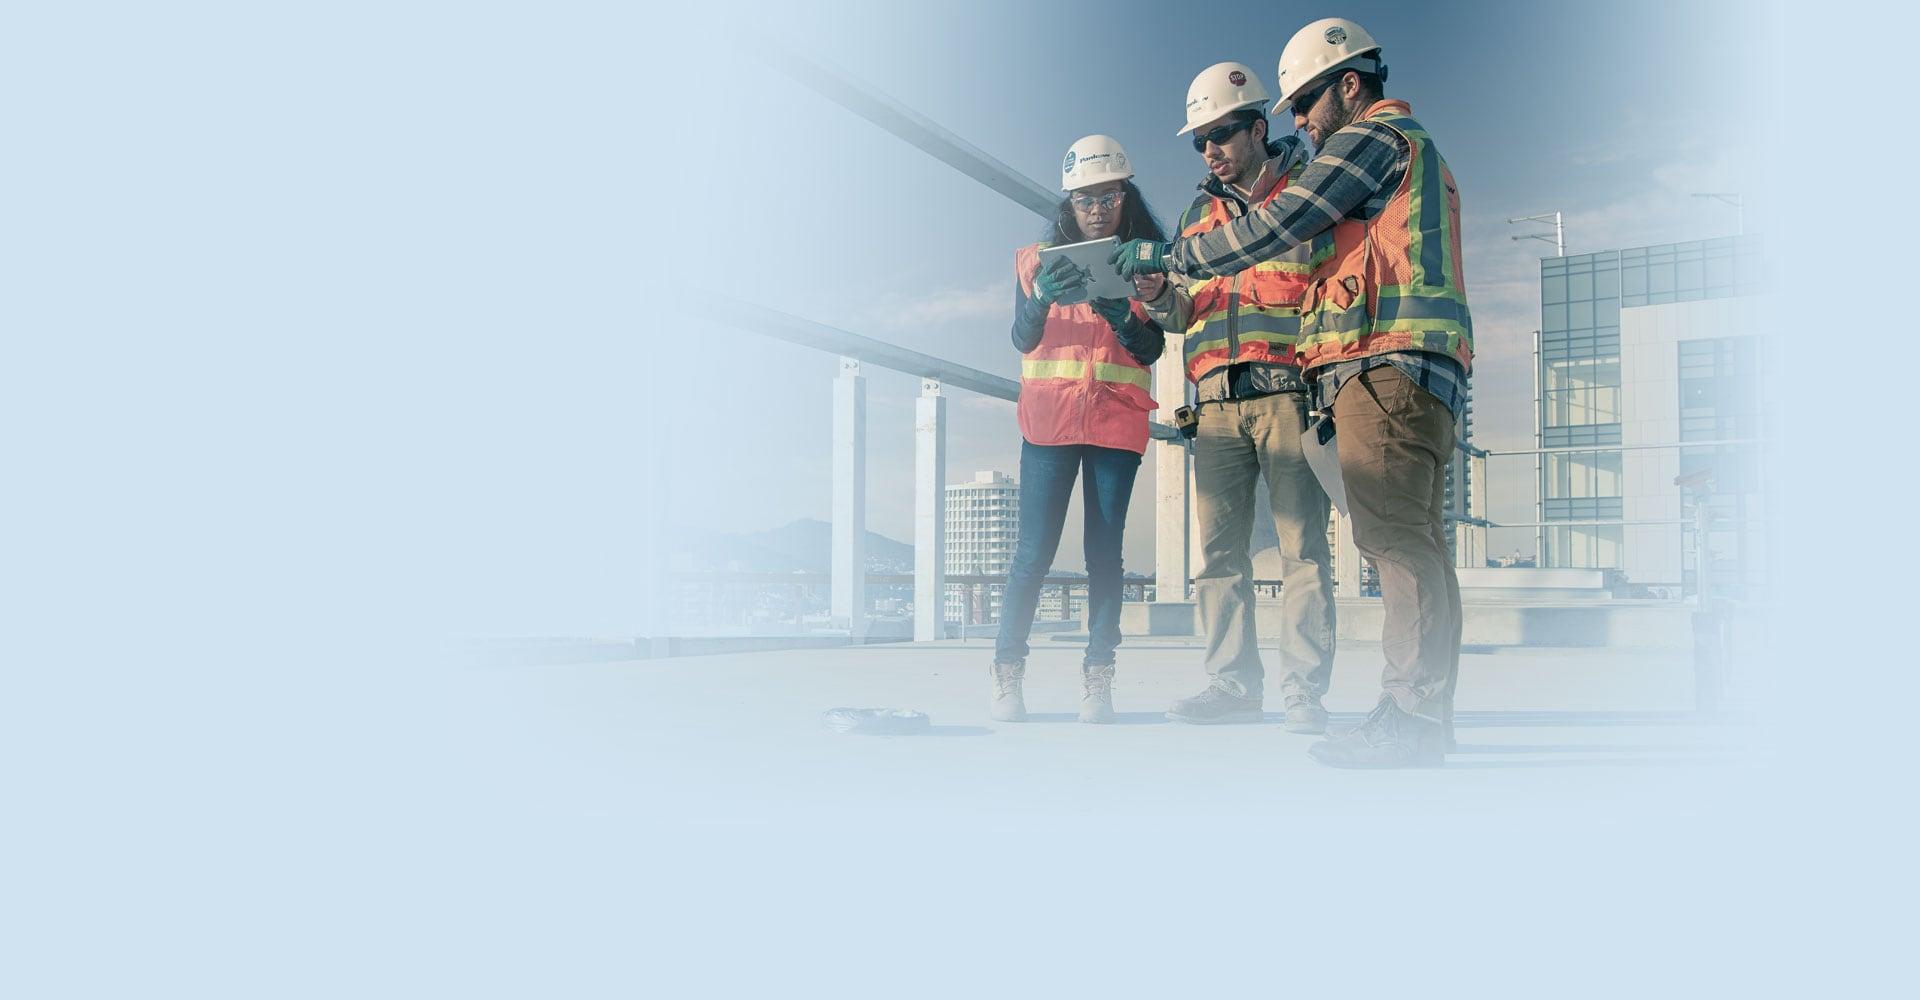 Constru o architecture engineering construction for Aec architecture engineering construction